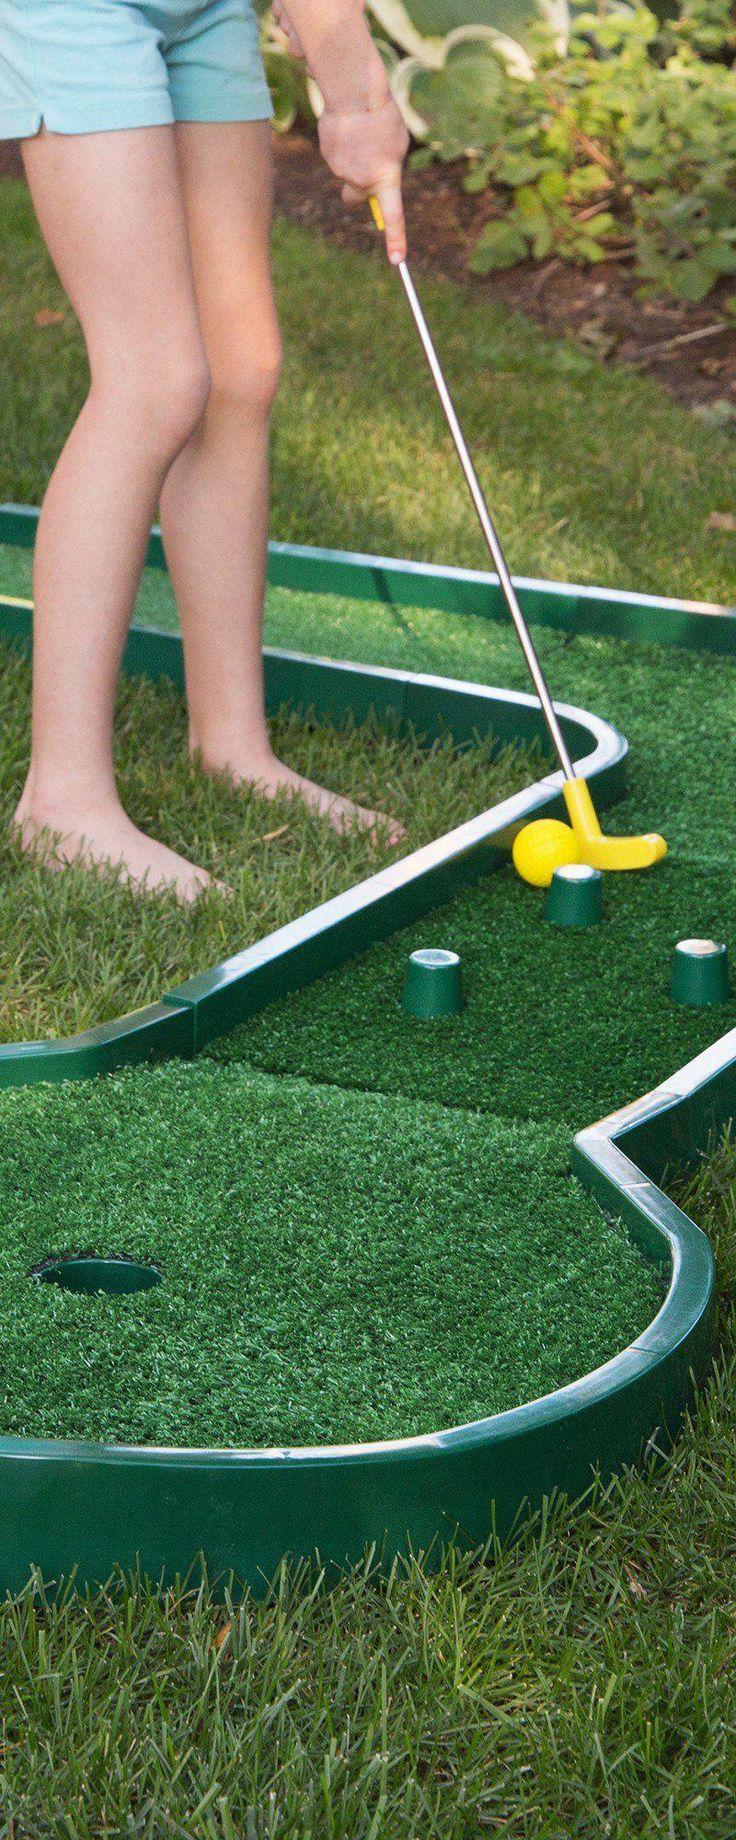 Tips And Tricks To Play A Great Game Of Football Mini Golf Course Mini Golf Mini Golf Set Backyard mini golf set